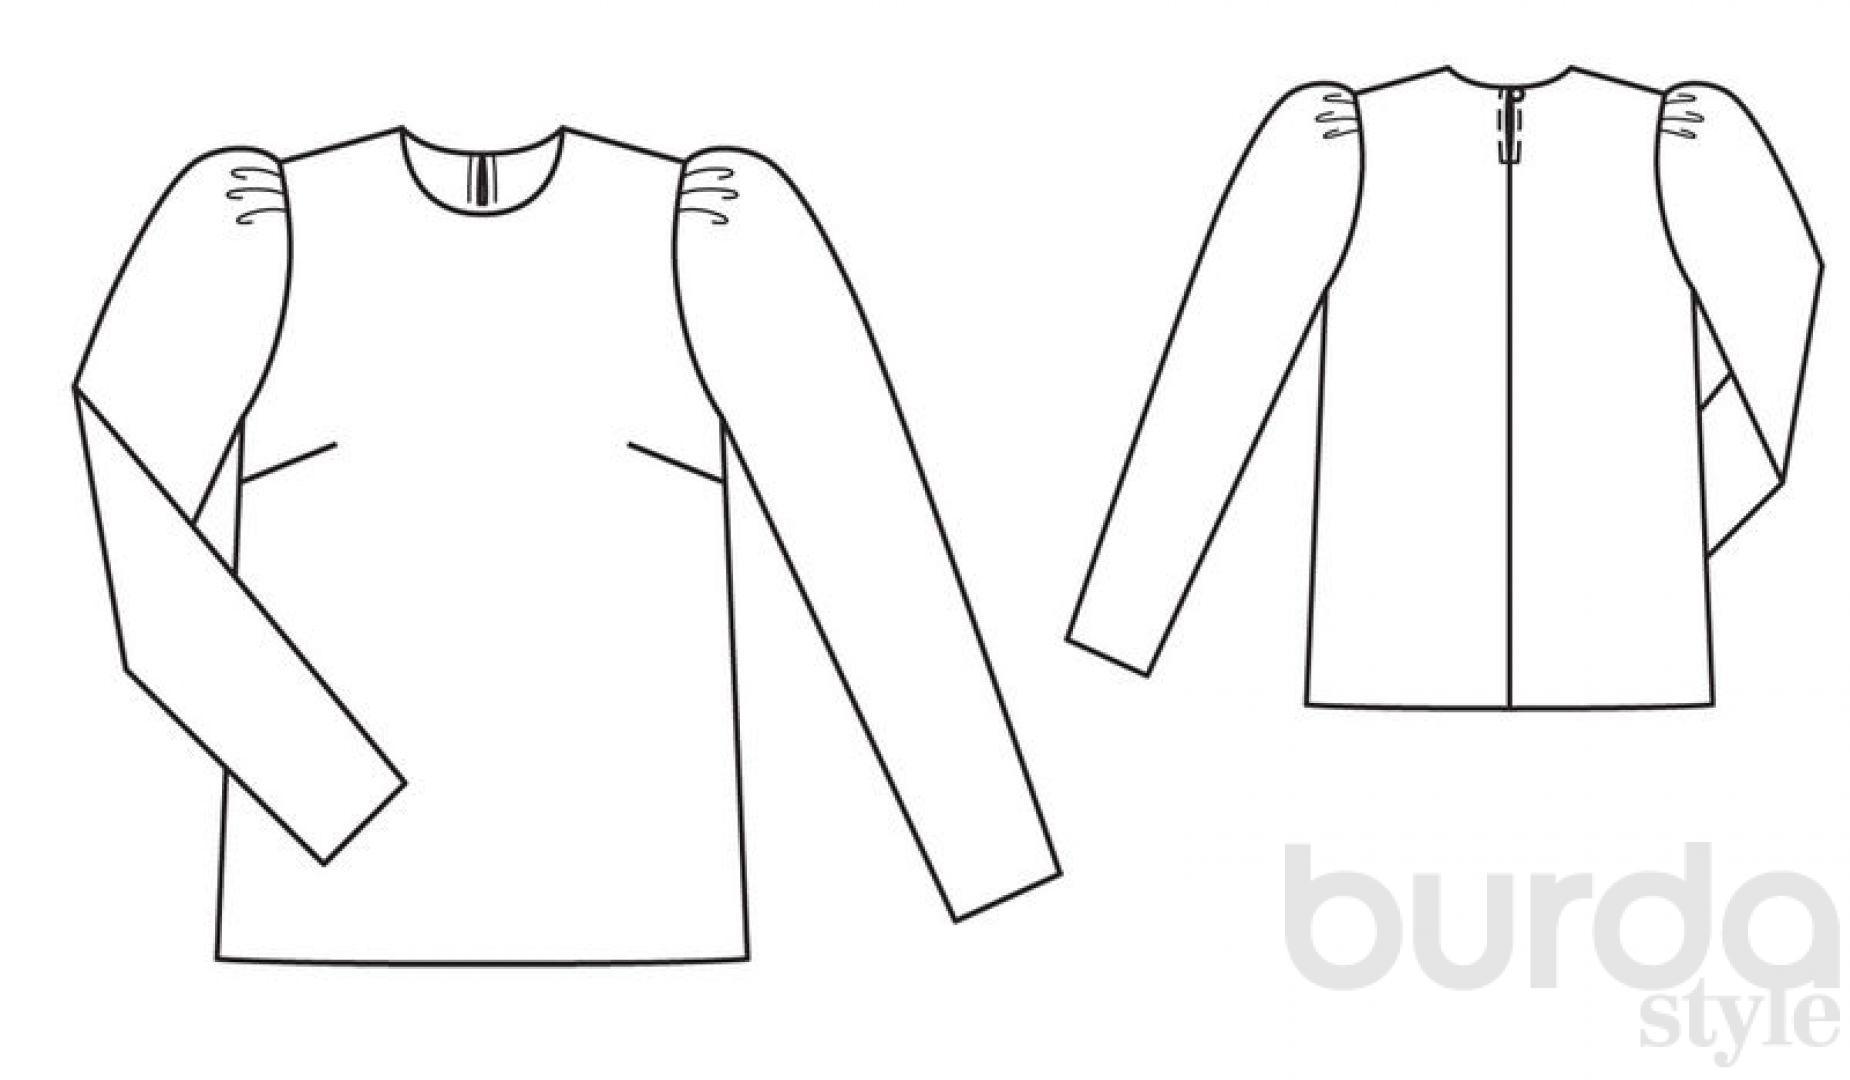 Шелкова блузка и юбка с хвостом